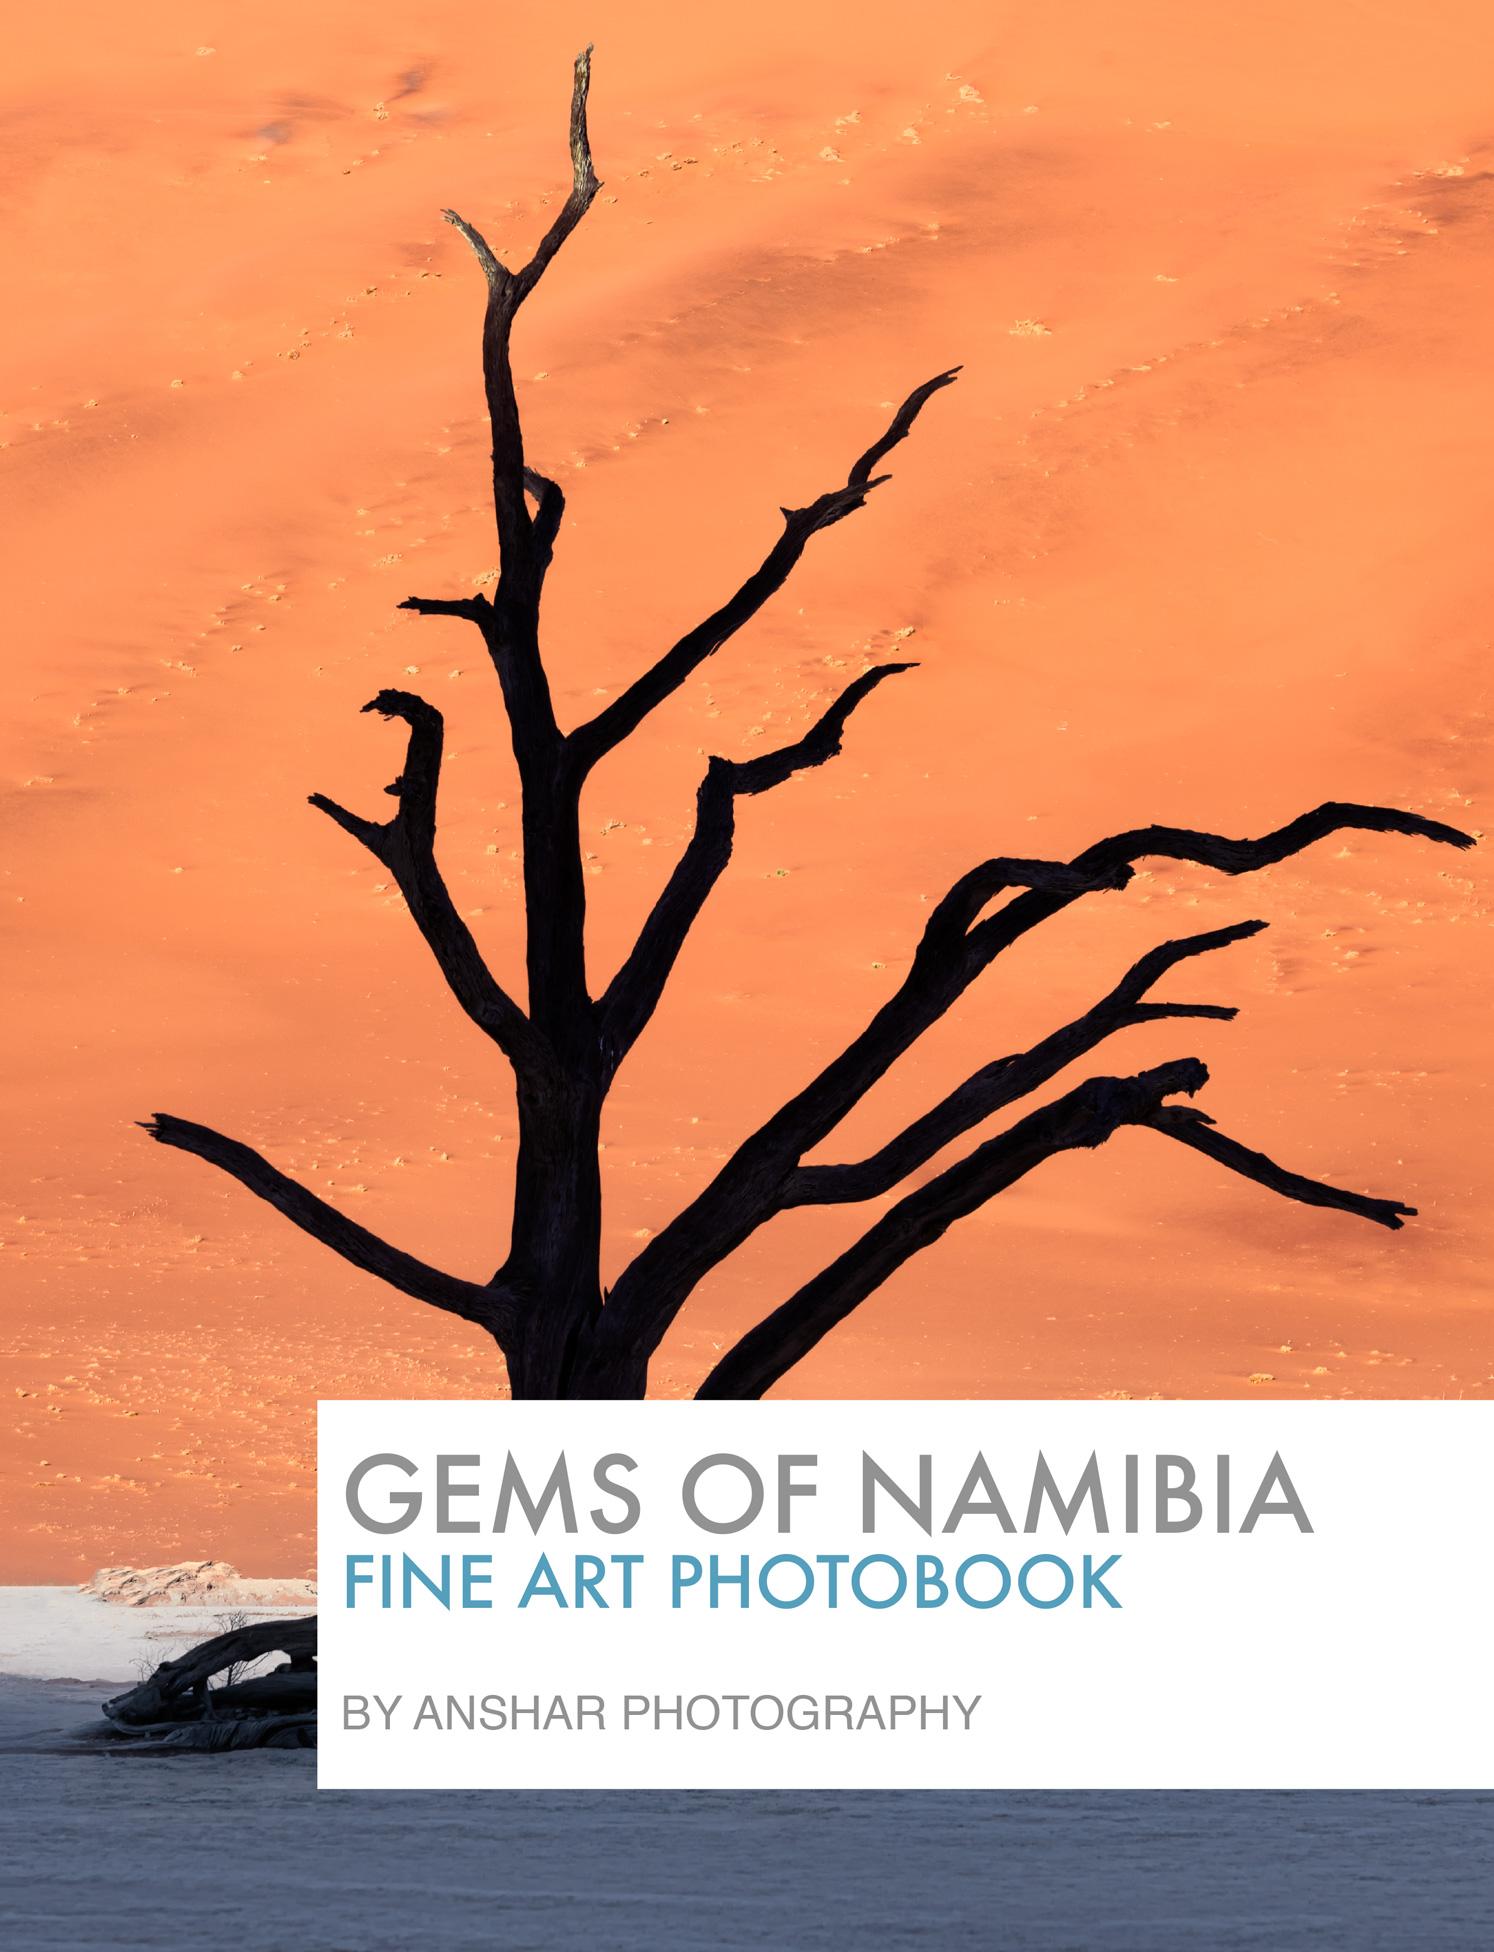 Gems of Namibia Fine Art Photobook by Anshar Photography